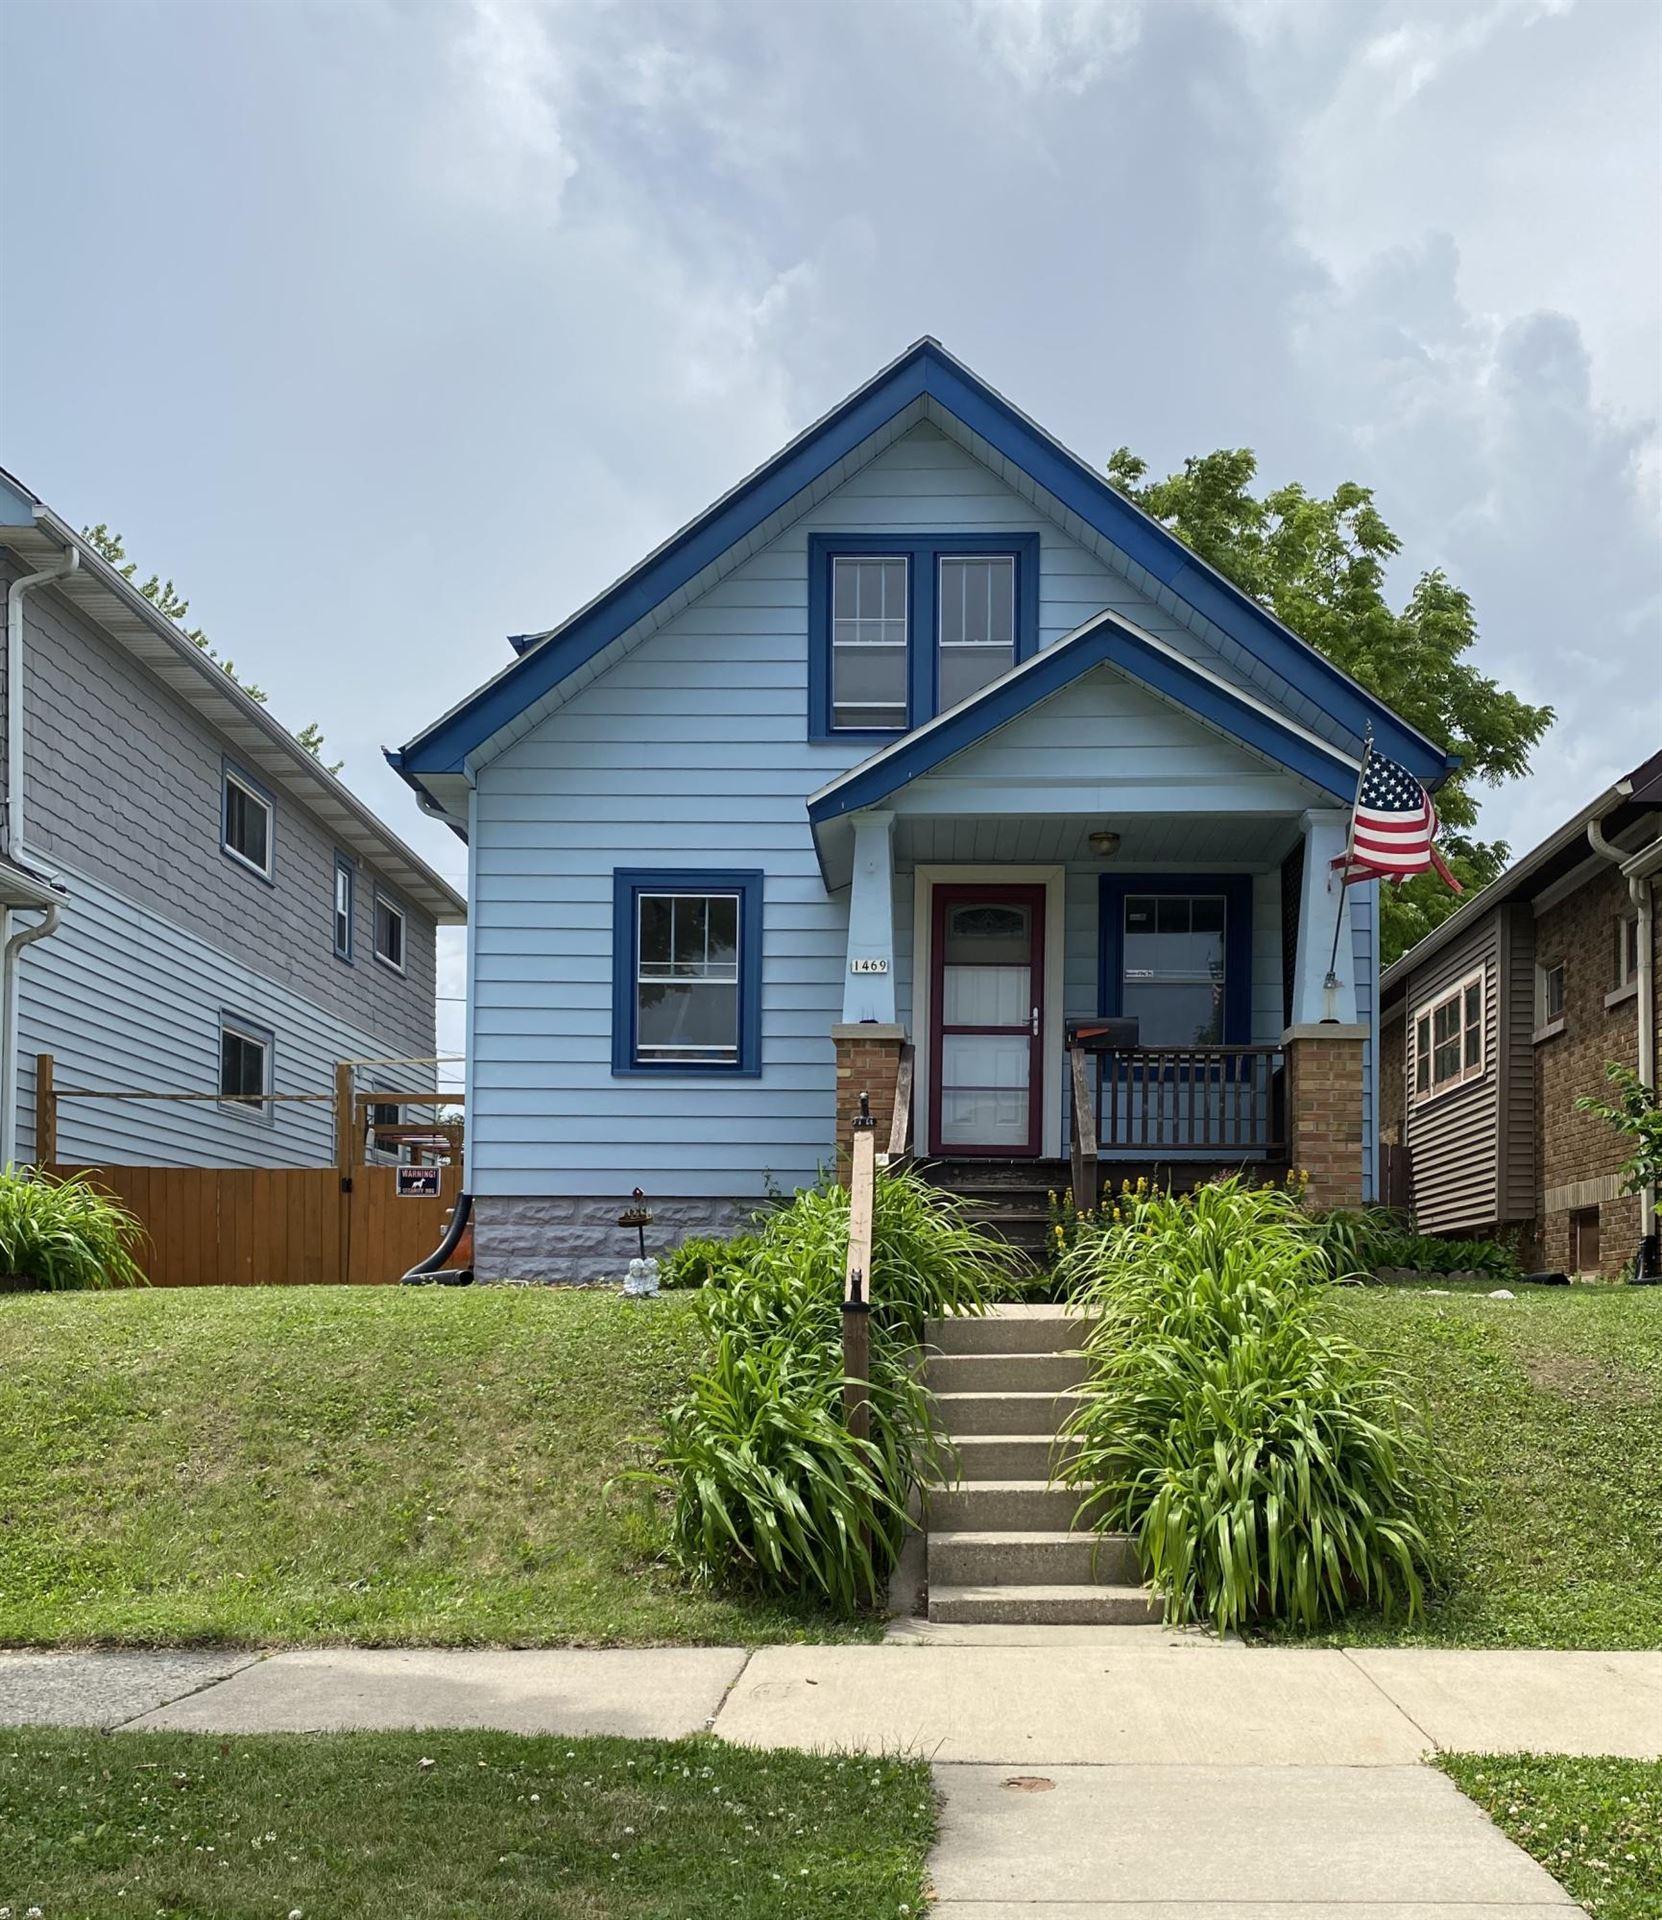 1469 S 55th St, West Milwaukee, WI 53214 - #: 1696470